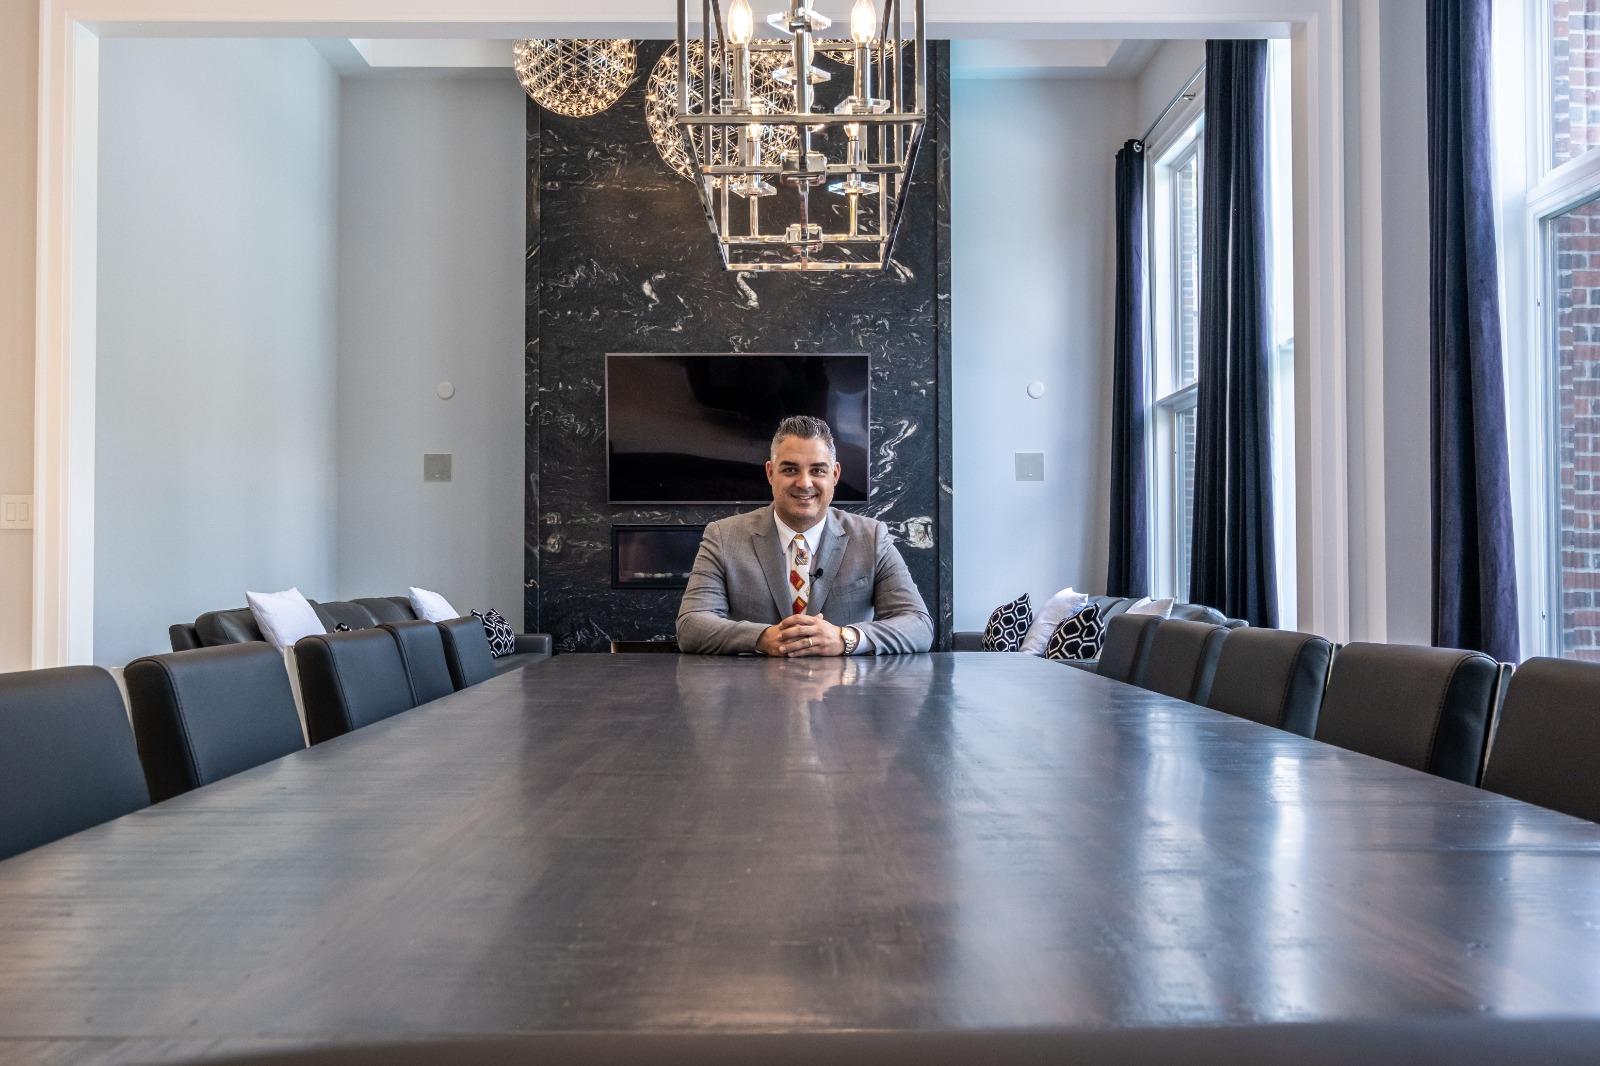 Trend-Setter Mark Salerno: A Pioneer of Social Media Marketing for Canadian Real Estate